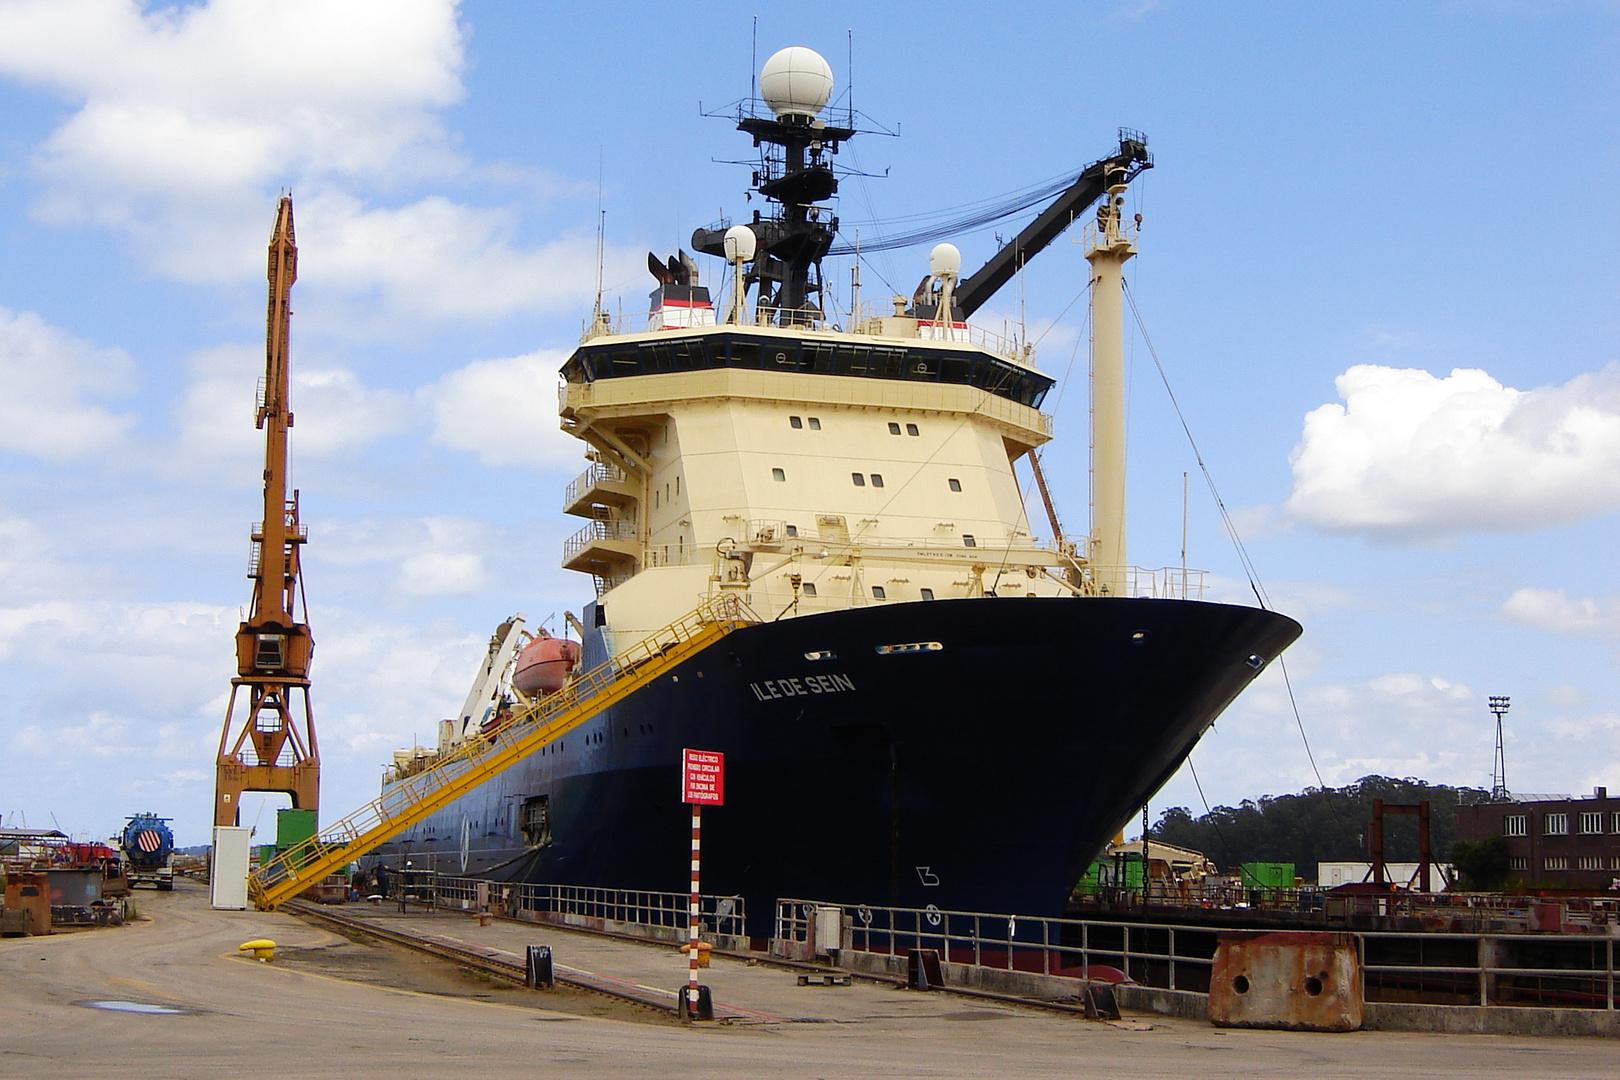 Ile de Sein vessel at Astander shipyard dry dock. Santander, Spain.